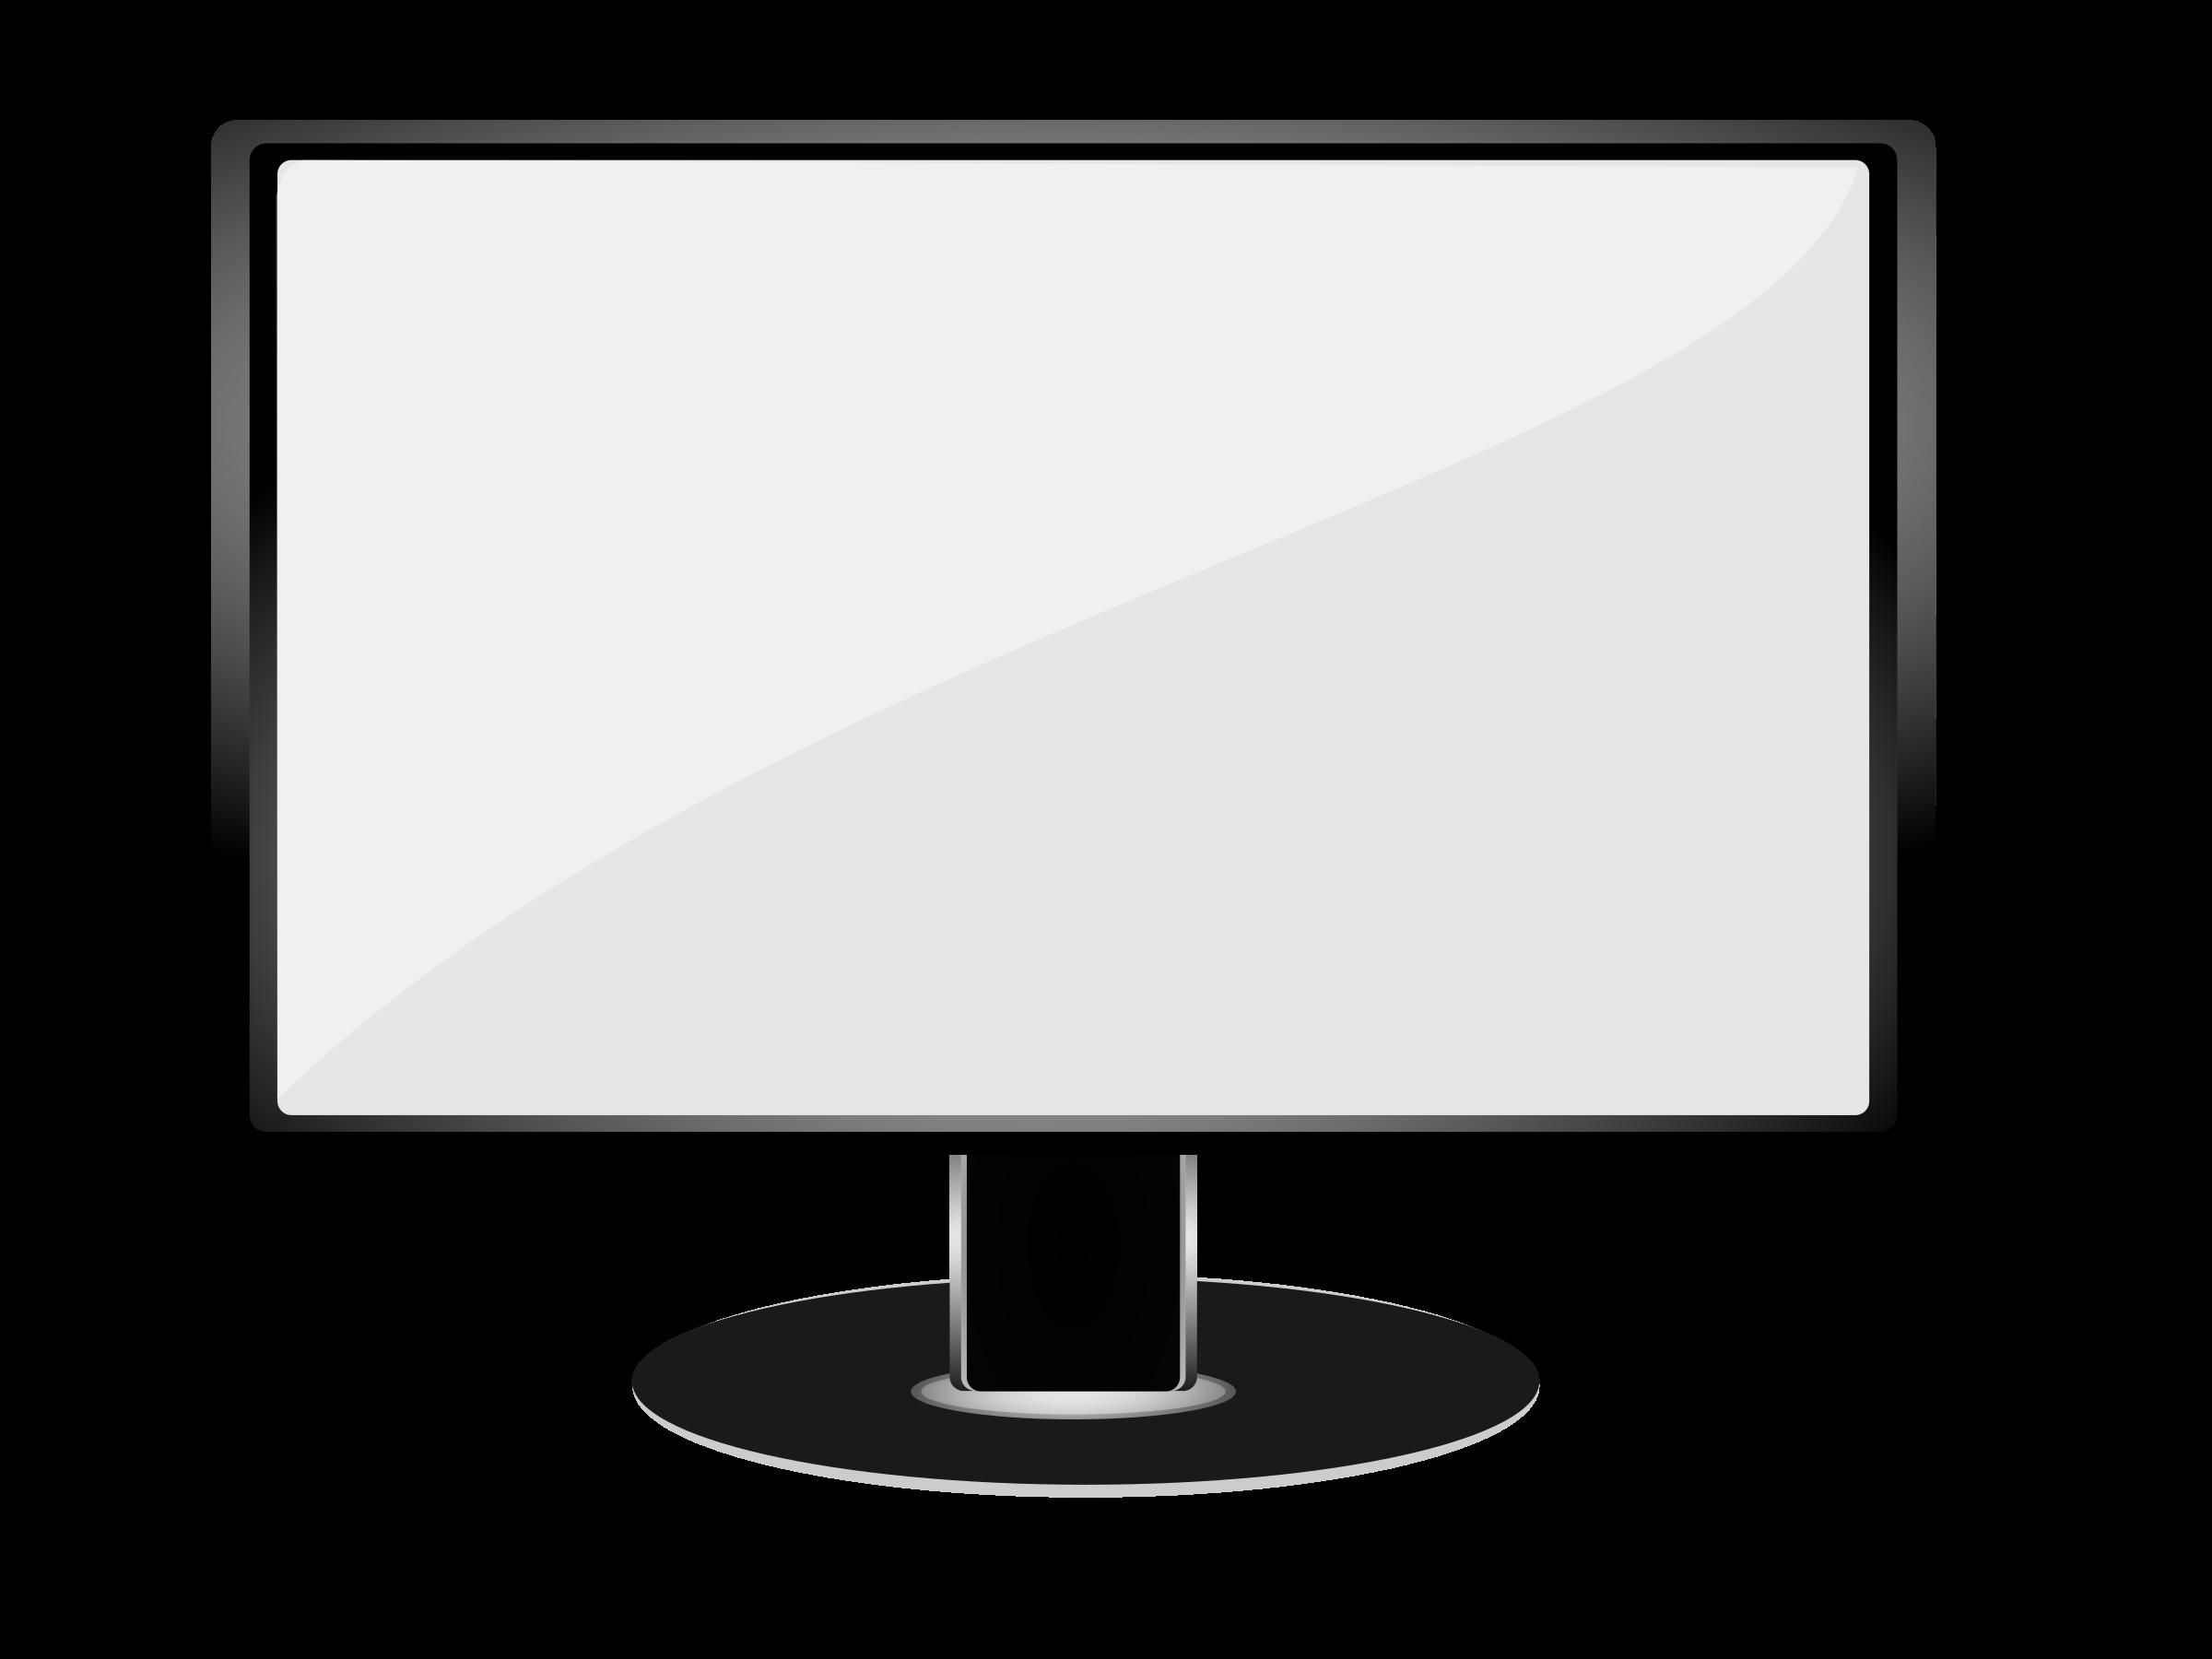 Clipart tv monitor. Big image png